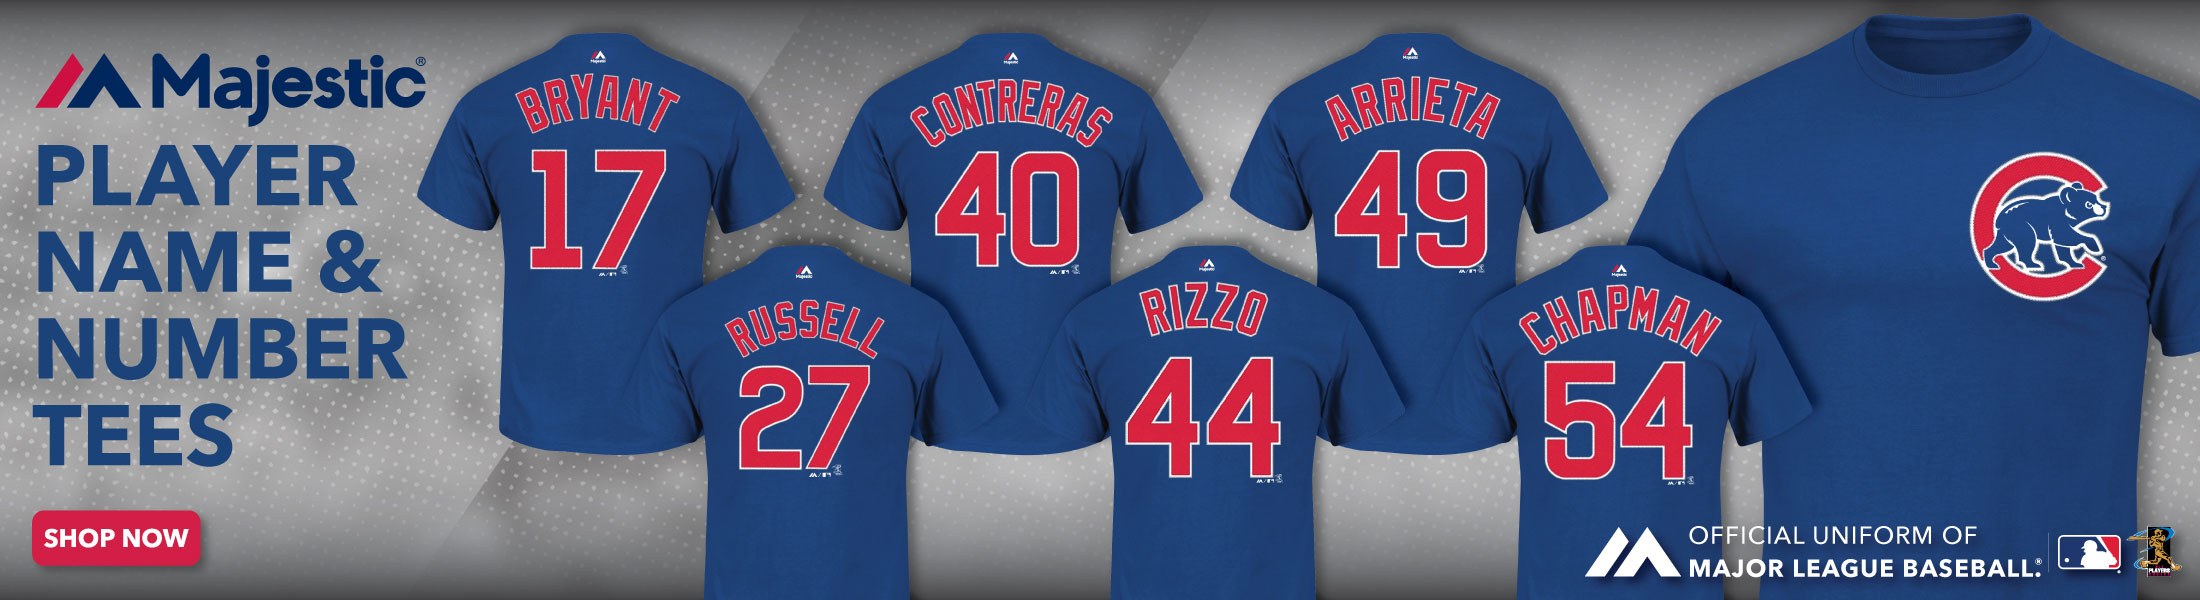 Chicago Cubs Player Shirts at SportsWorldChicago.com